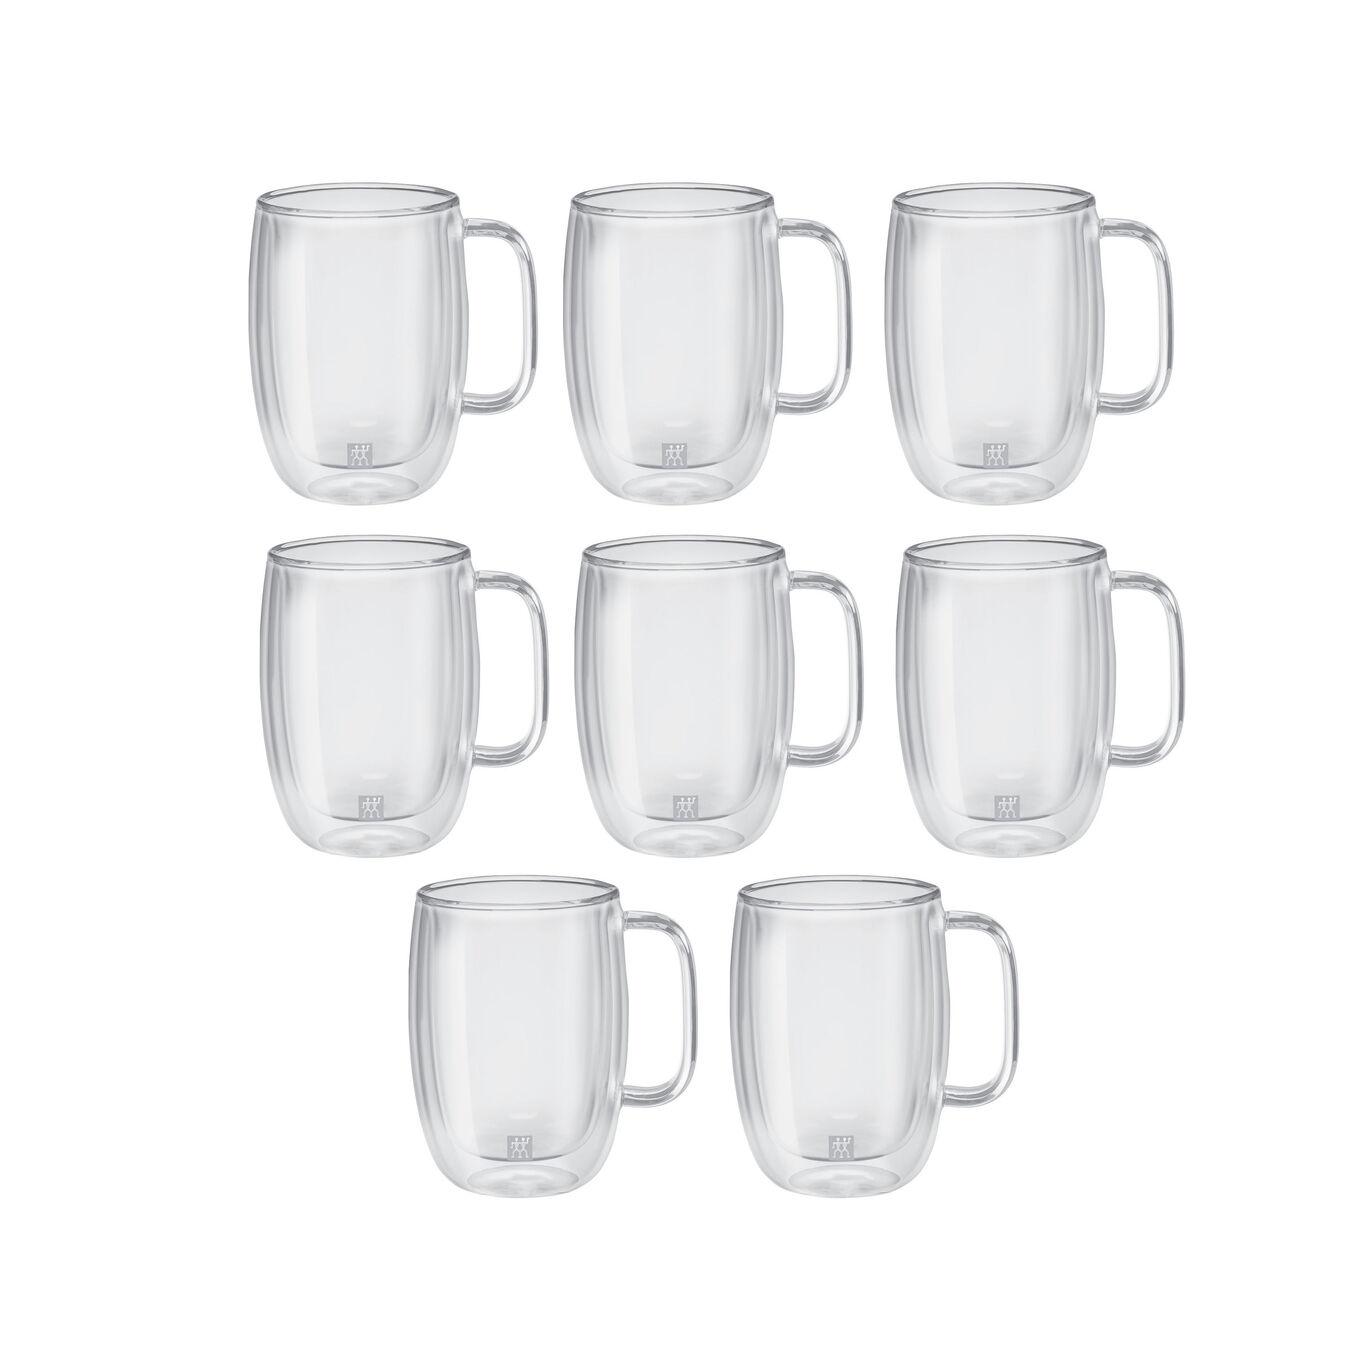 8 Piece Latte glass set - Buy 6 Get 8,,large 1